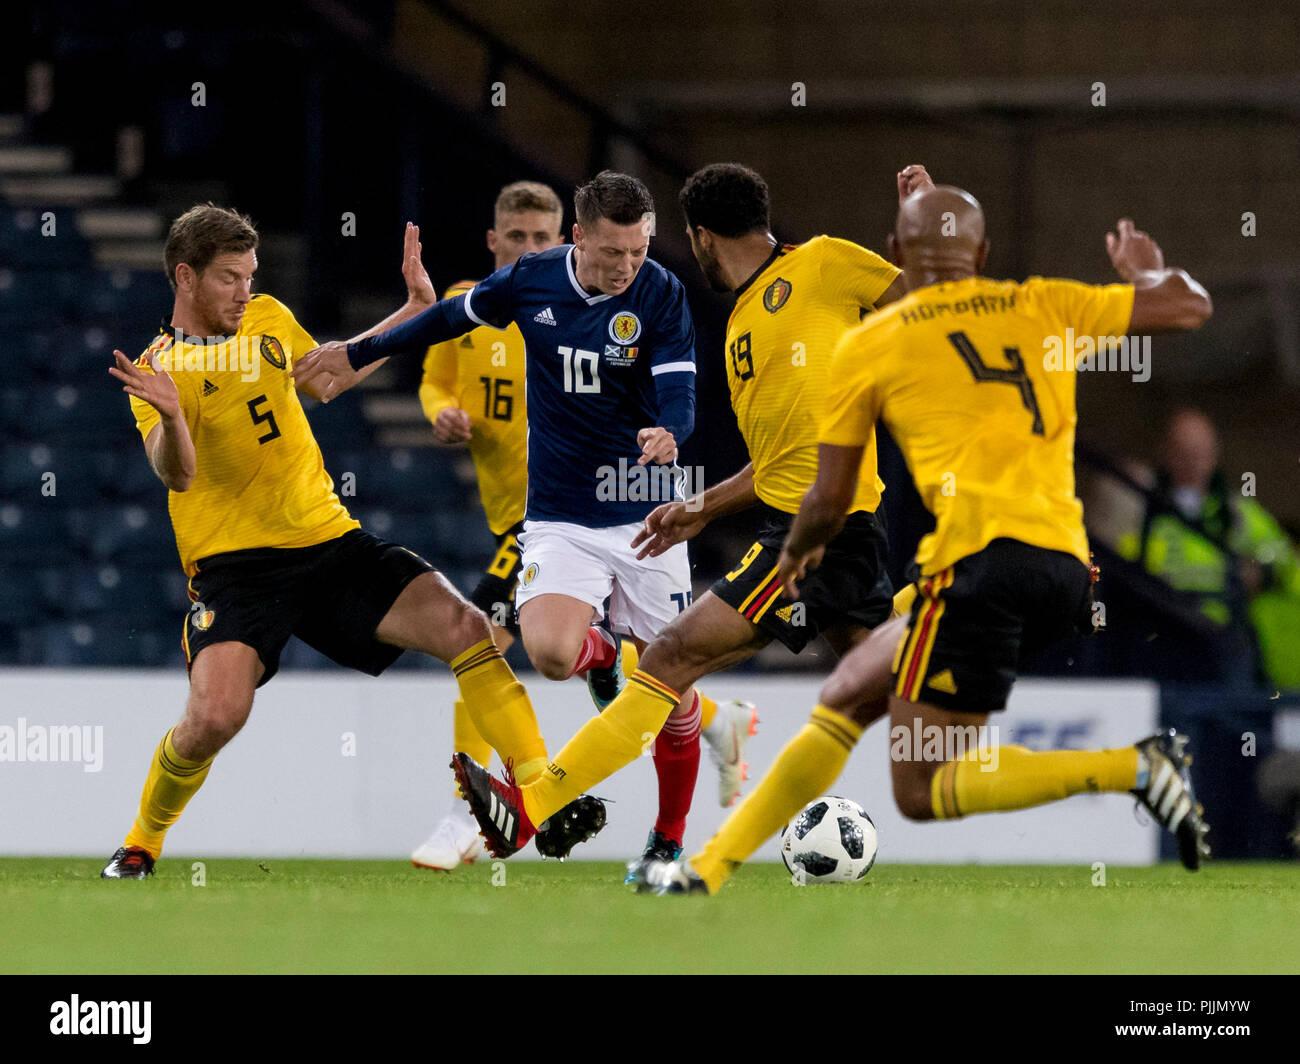 Hampden Park, Glasgow, UK. 7th Sep, 2018. International Football Friendly, Scotland versus Belgium; no way through for Callum McGregor of Scotland Credit: Action Plus Sports/Alamy Live News - Stock Image